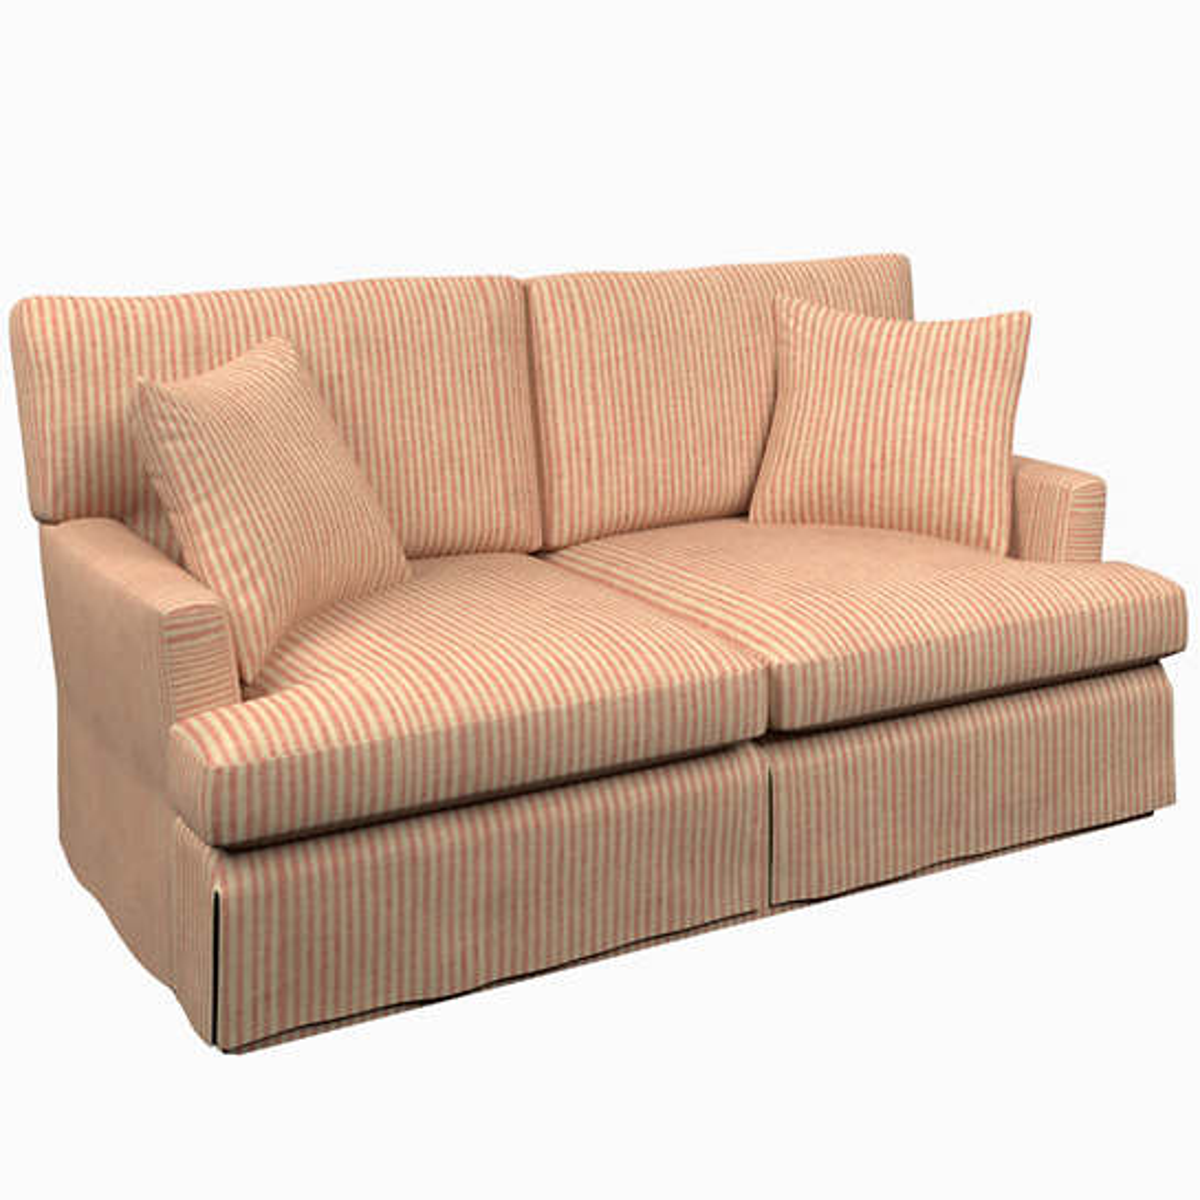 Adams Ticking Brick Saybrook 2 Seater Slipcovered Sofa